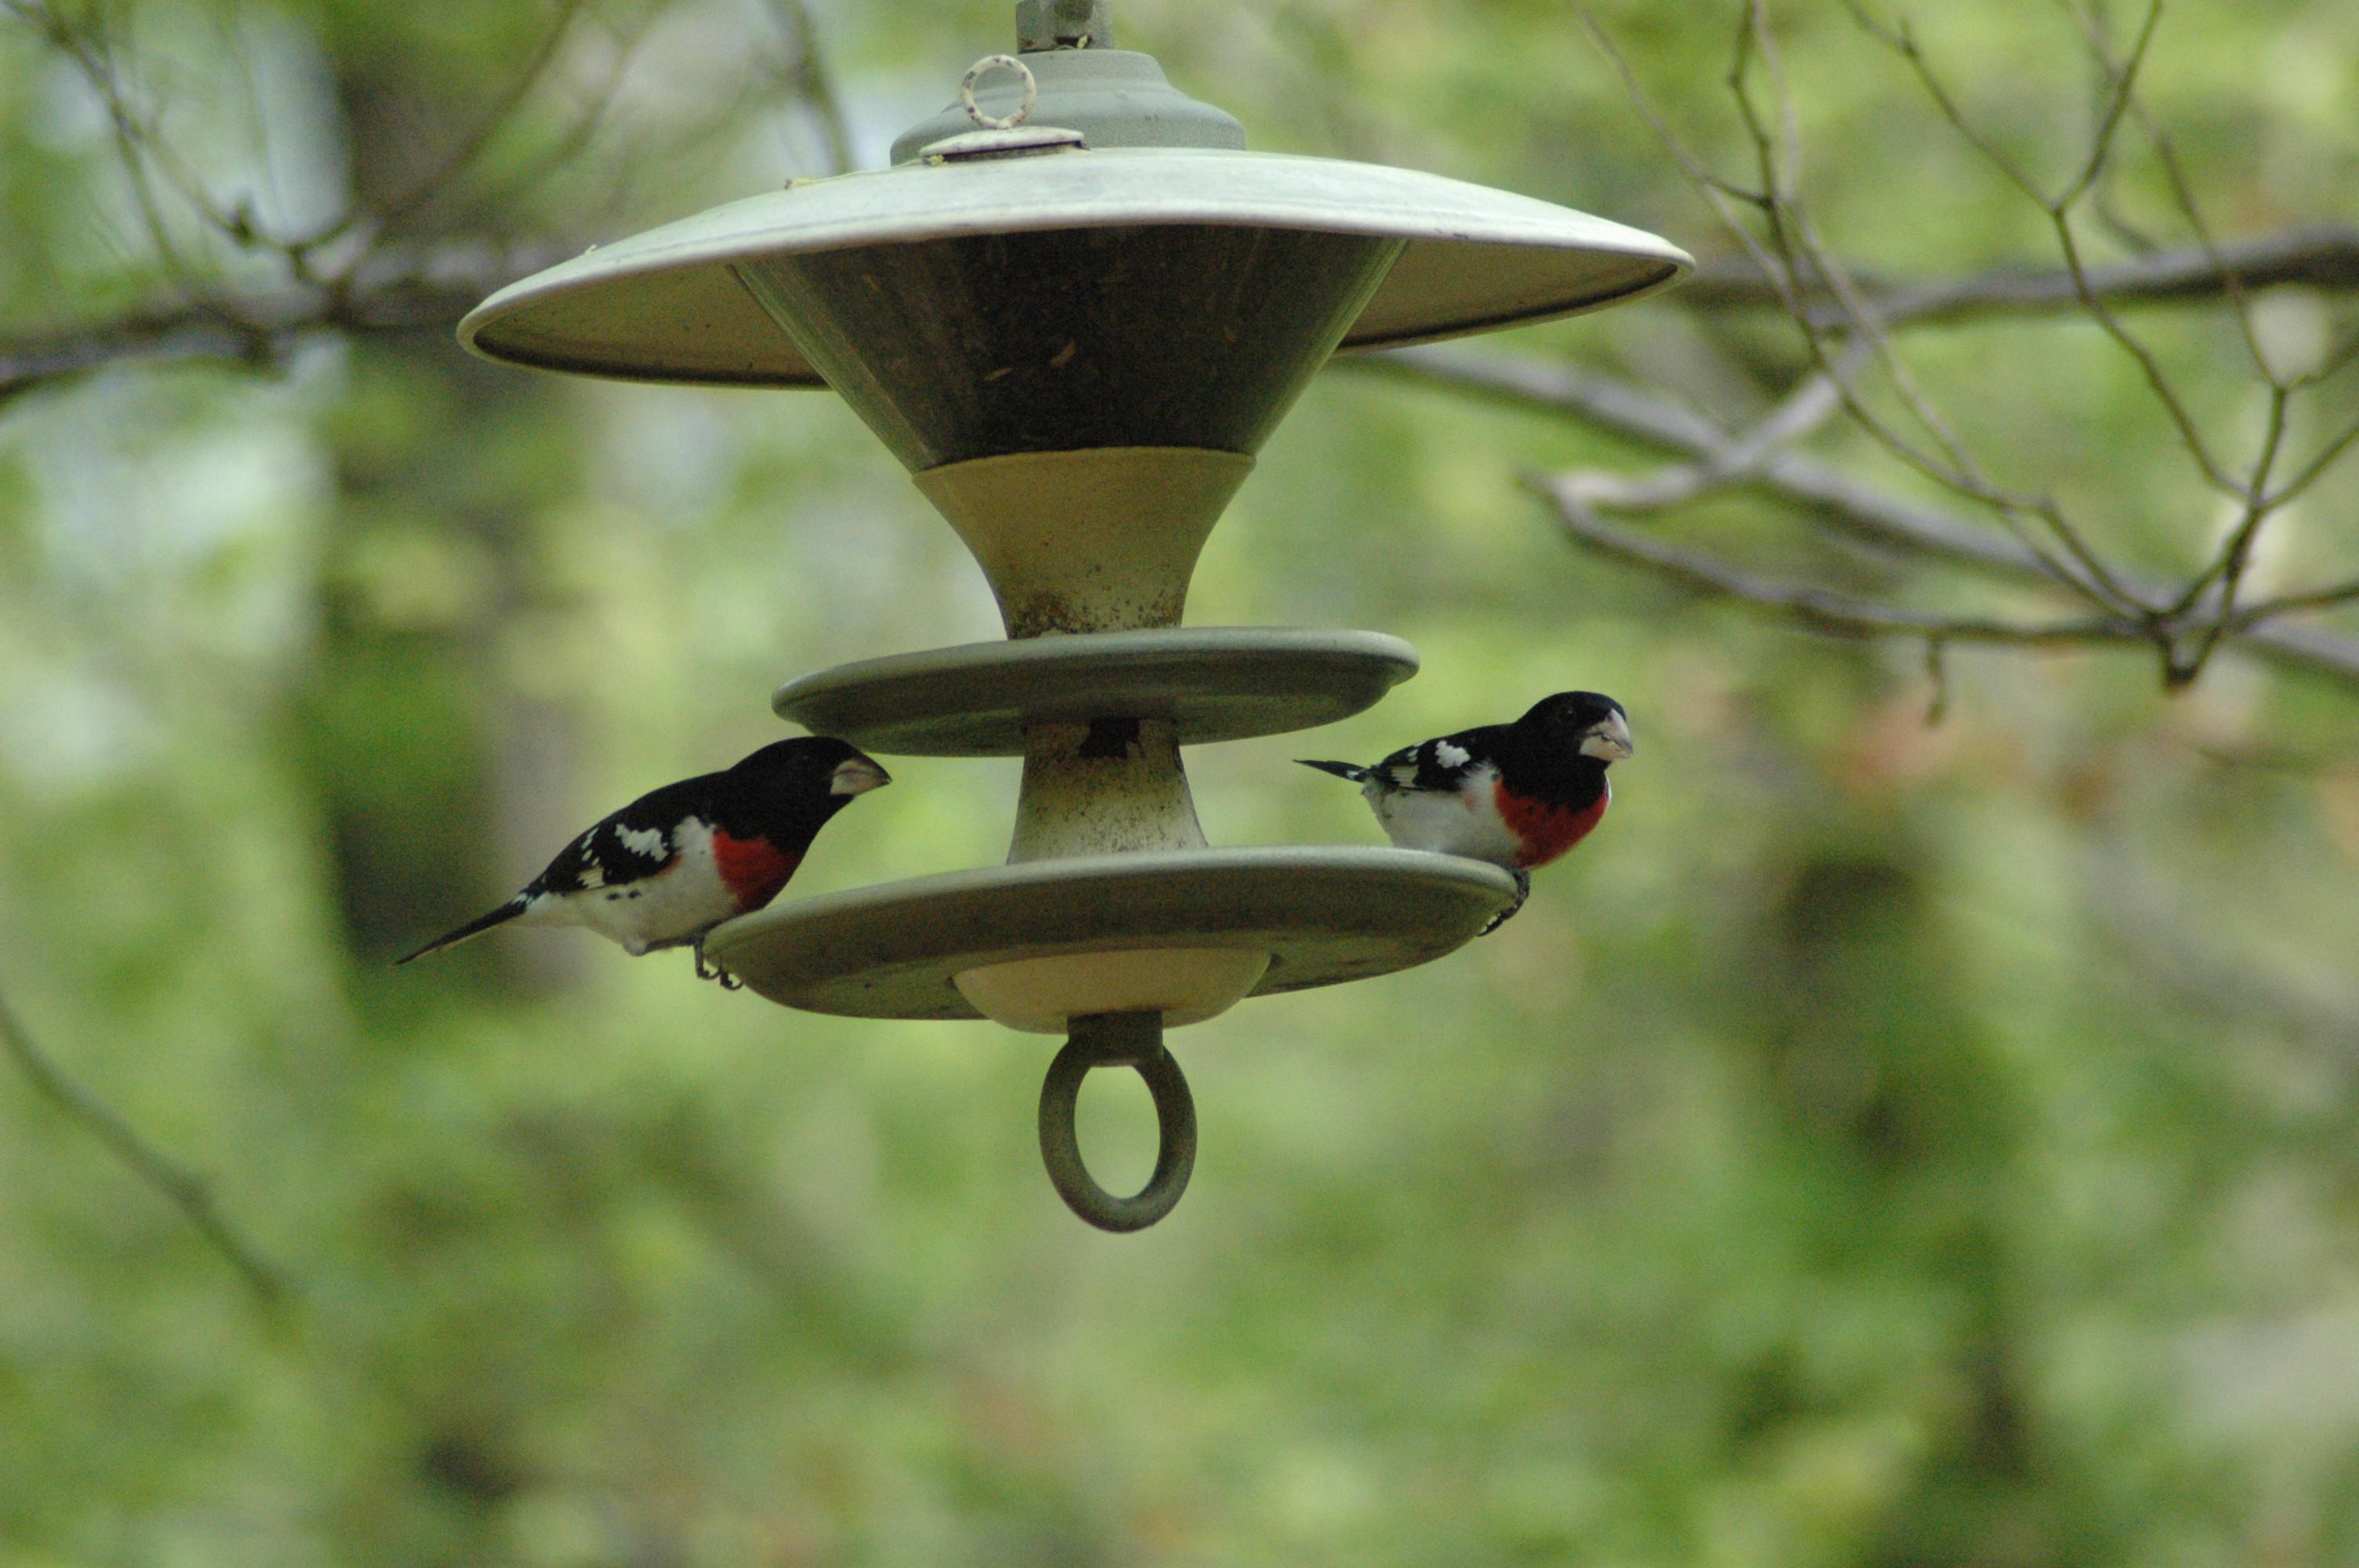 Rose-breasted grosbeaks at feeder - Should you feed birds in summer